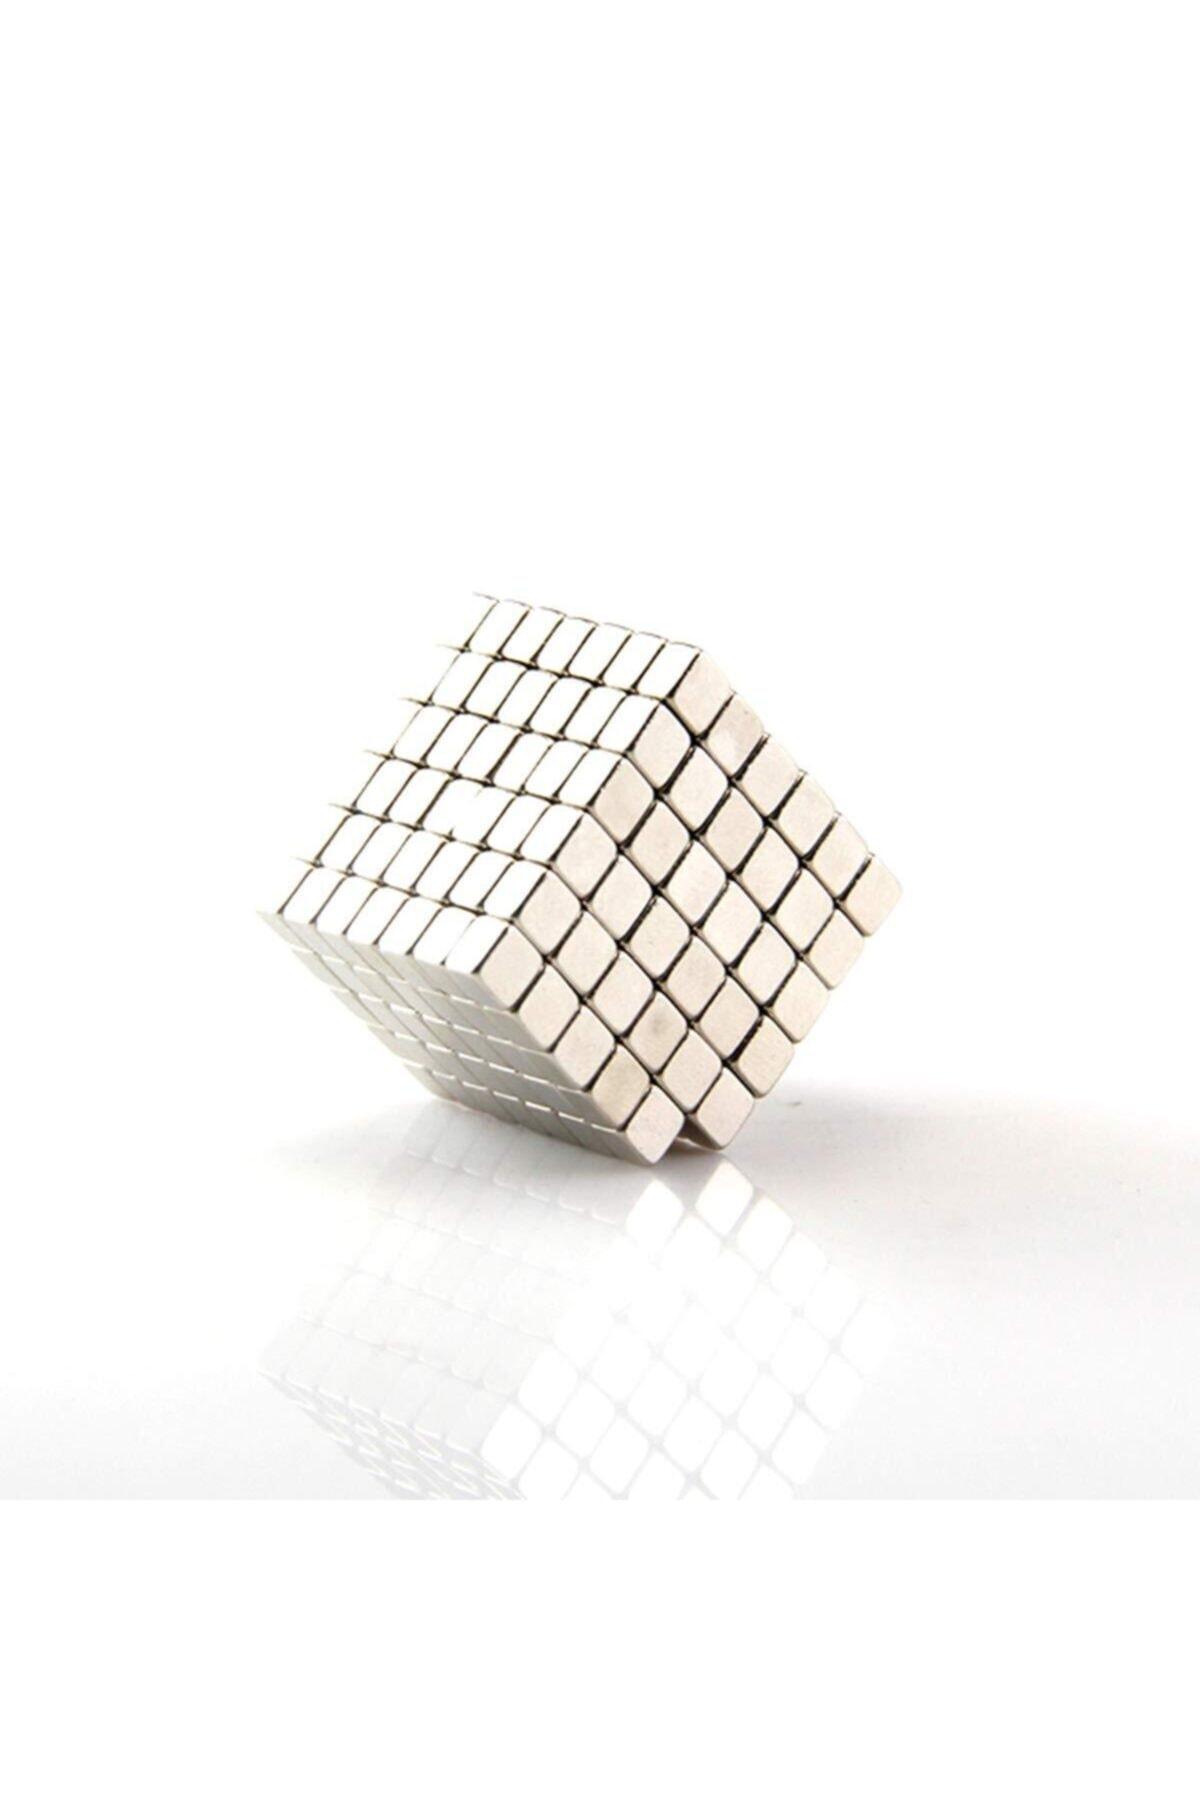 Dünya Magnet 50 Adet 3mm x 3mm X 3mm Güçlü Küp Neodyum Mıknatıs(50'li Paket) 2